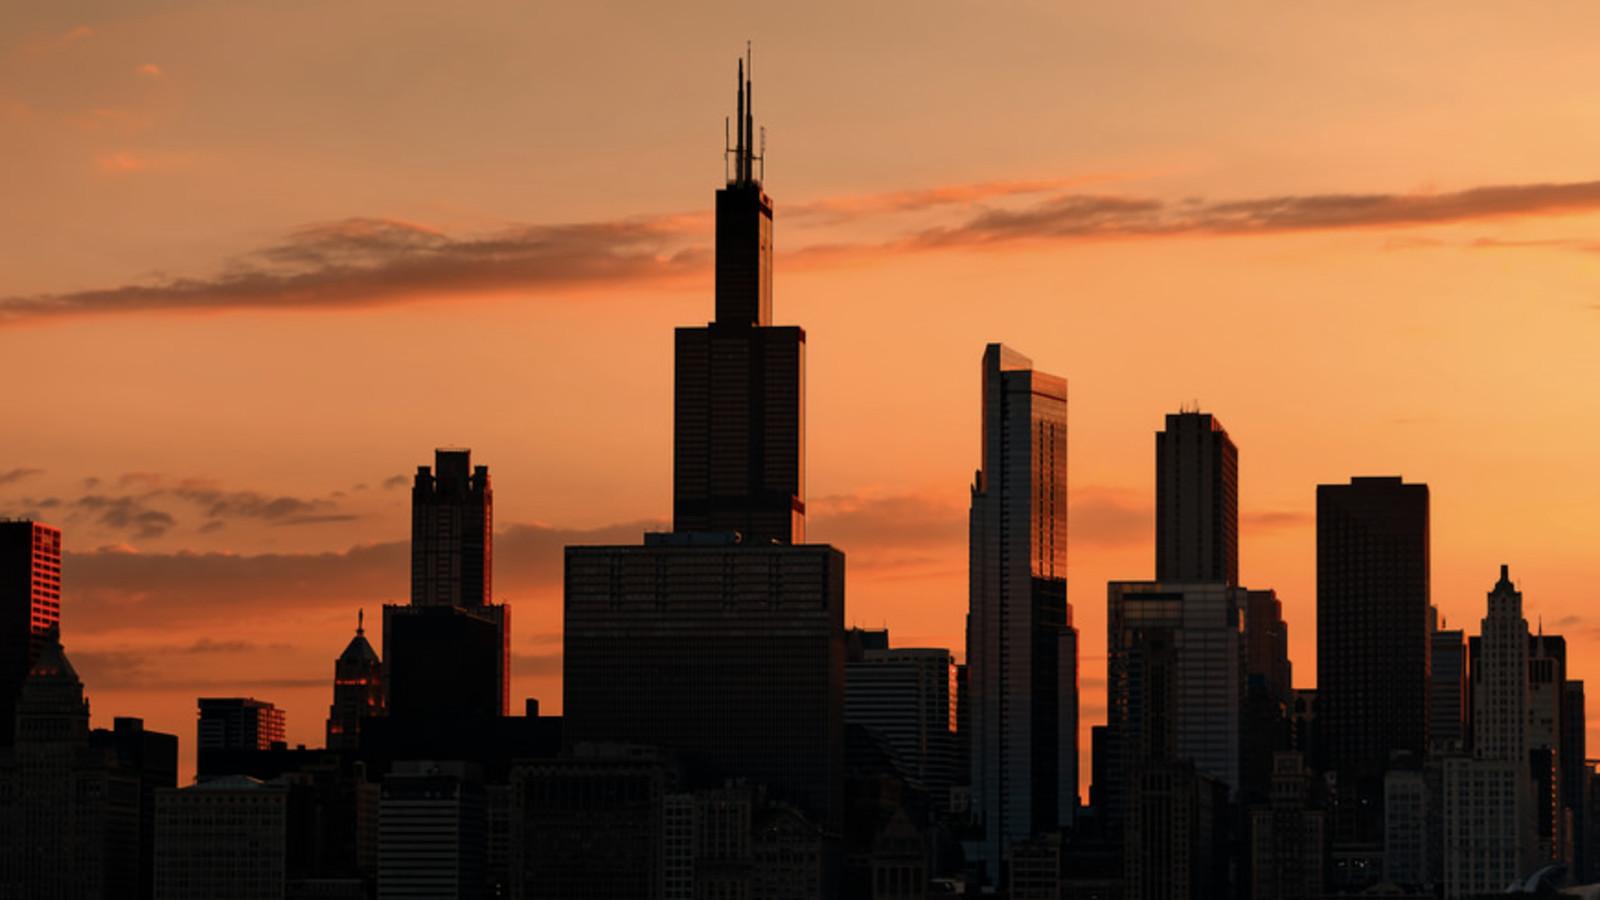 chicago weather - photo #20